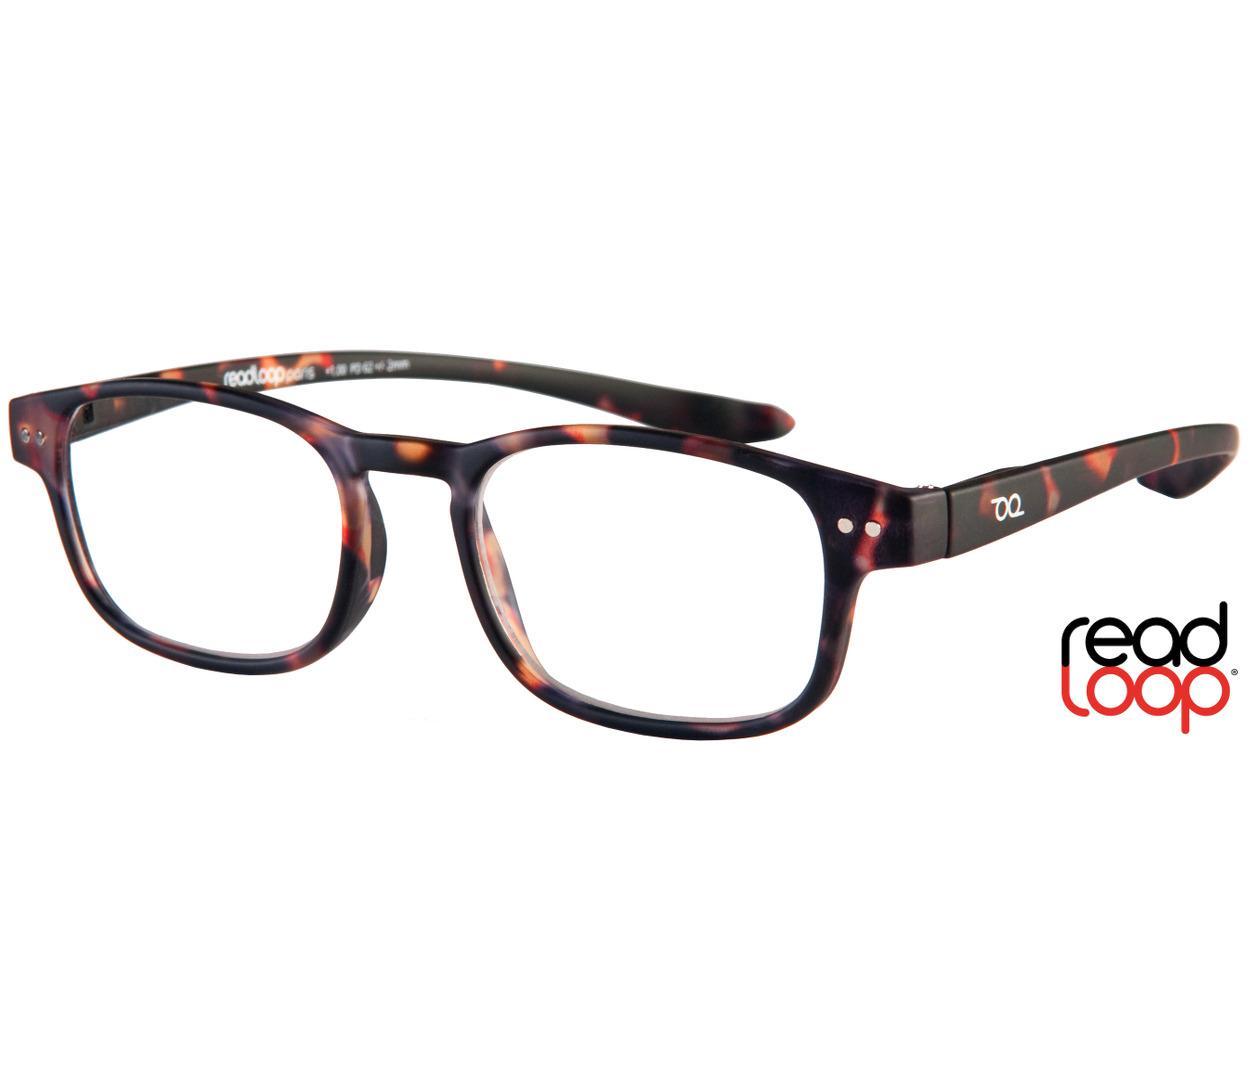 Main Image (Angle) - Manta (Tortoiseshell) Classic Reading Glasses